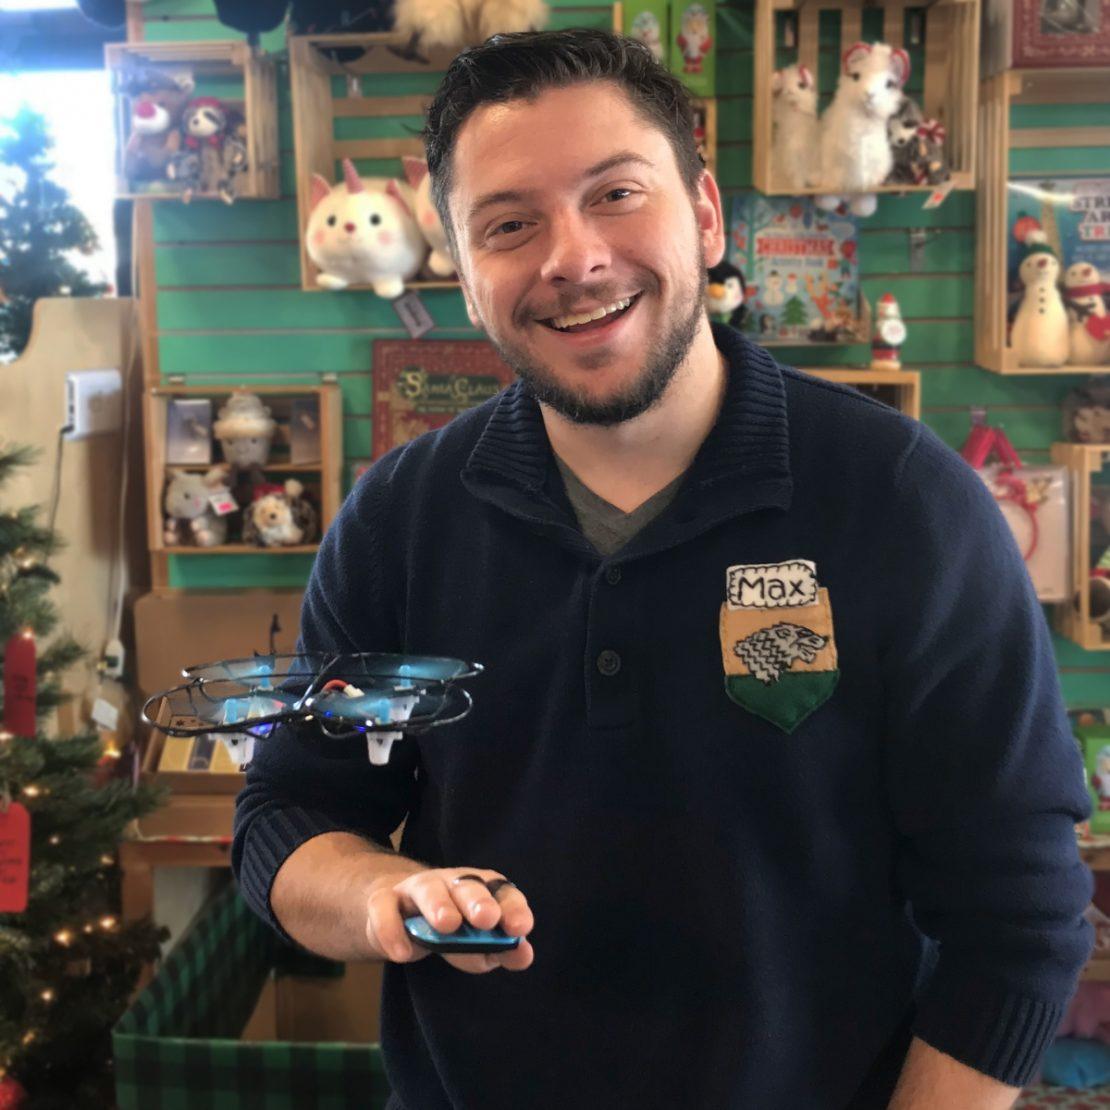 Skyline X Force Drone, Max's Pick